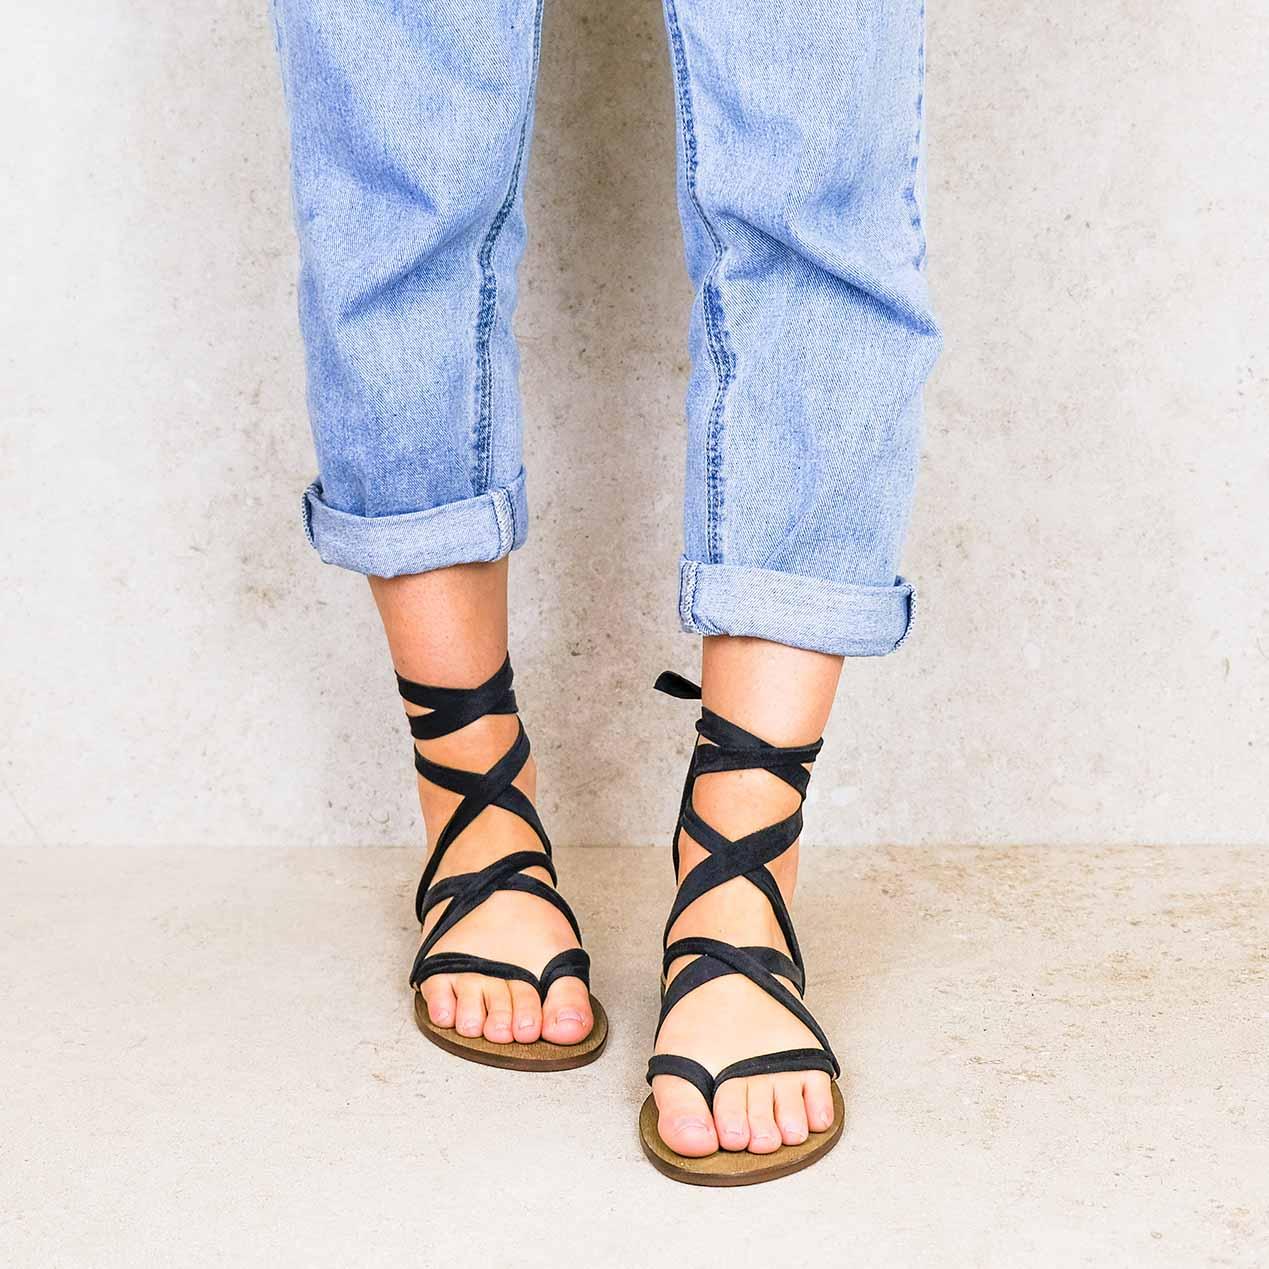 Cancun2-lintsandalen sandals travelsandals vegan sustainable sandals wikkelsandalen